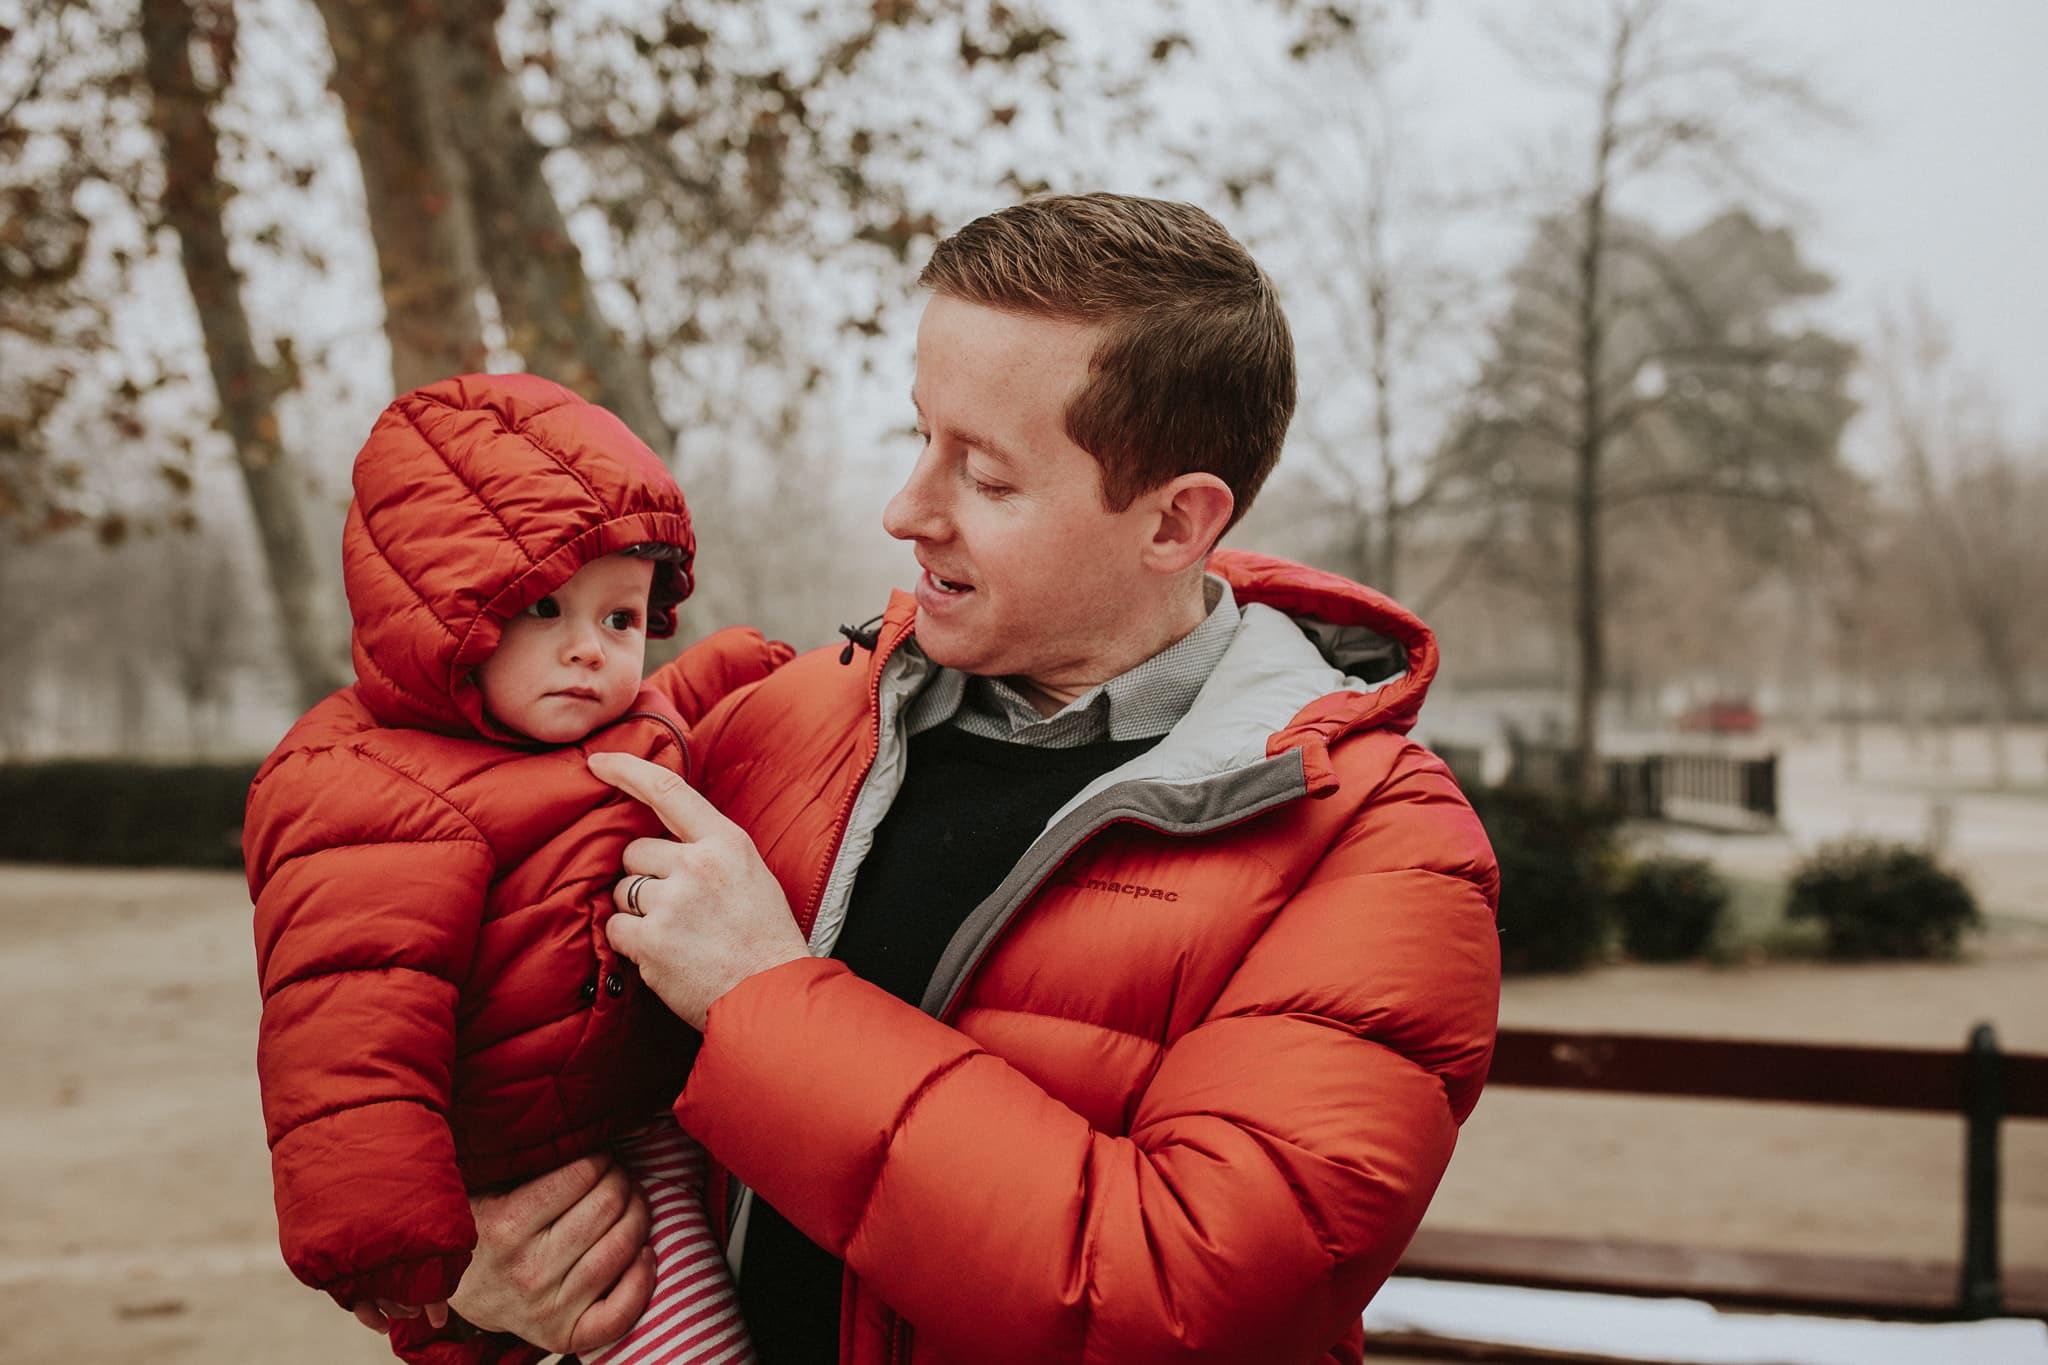 Family-Photoshoot-Madrid-14